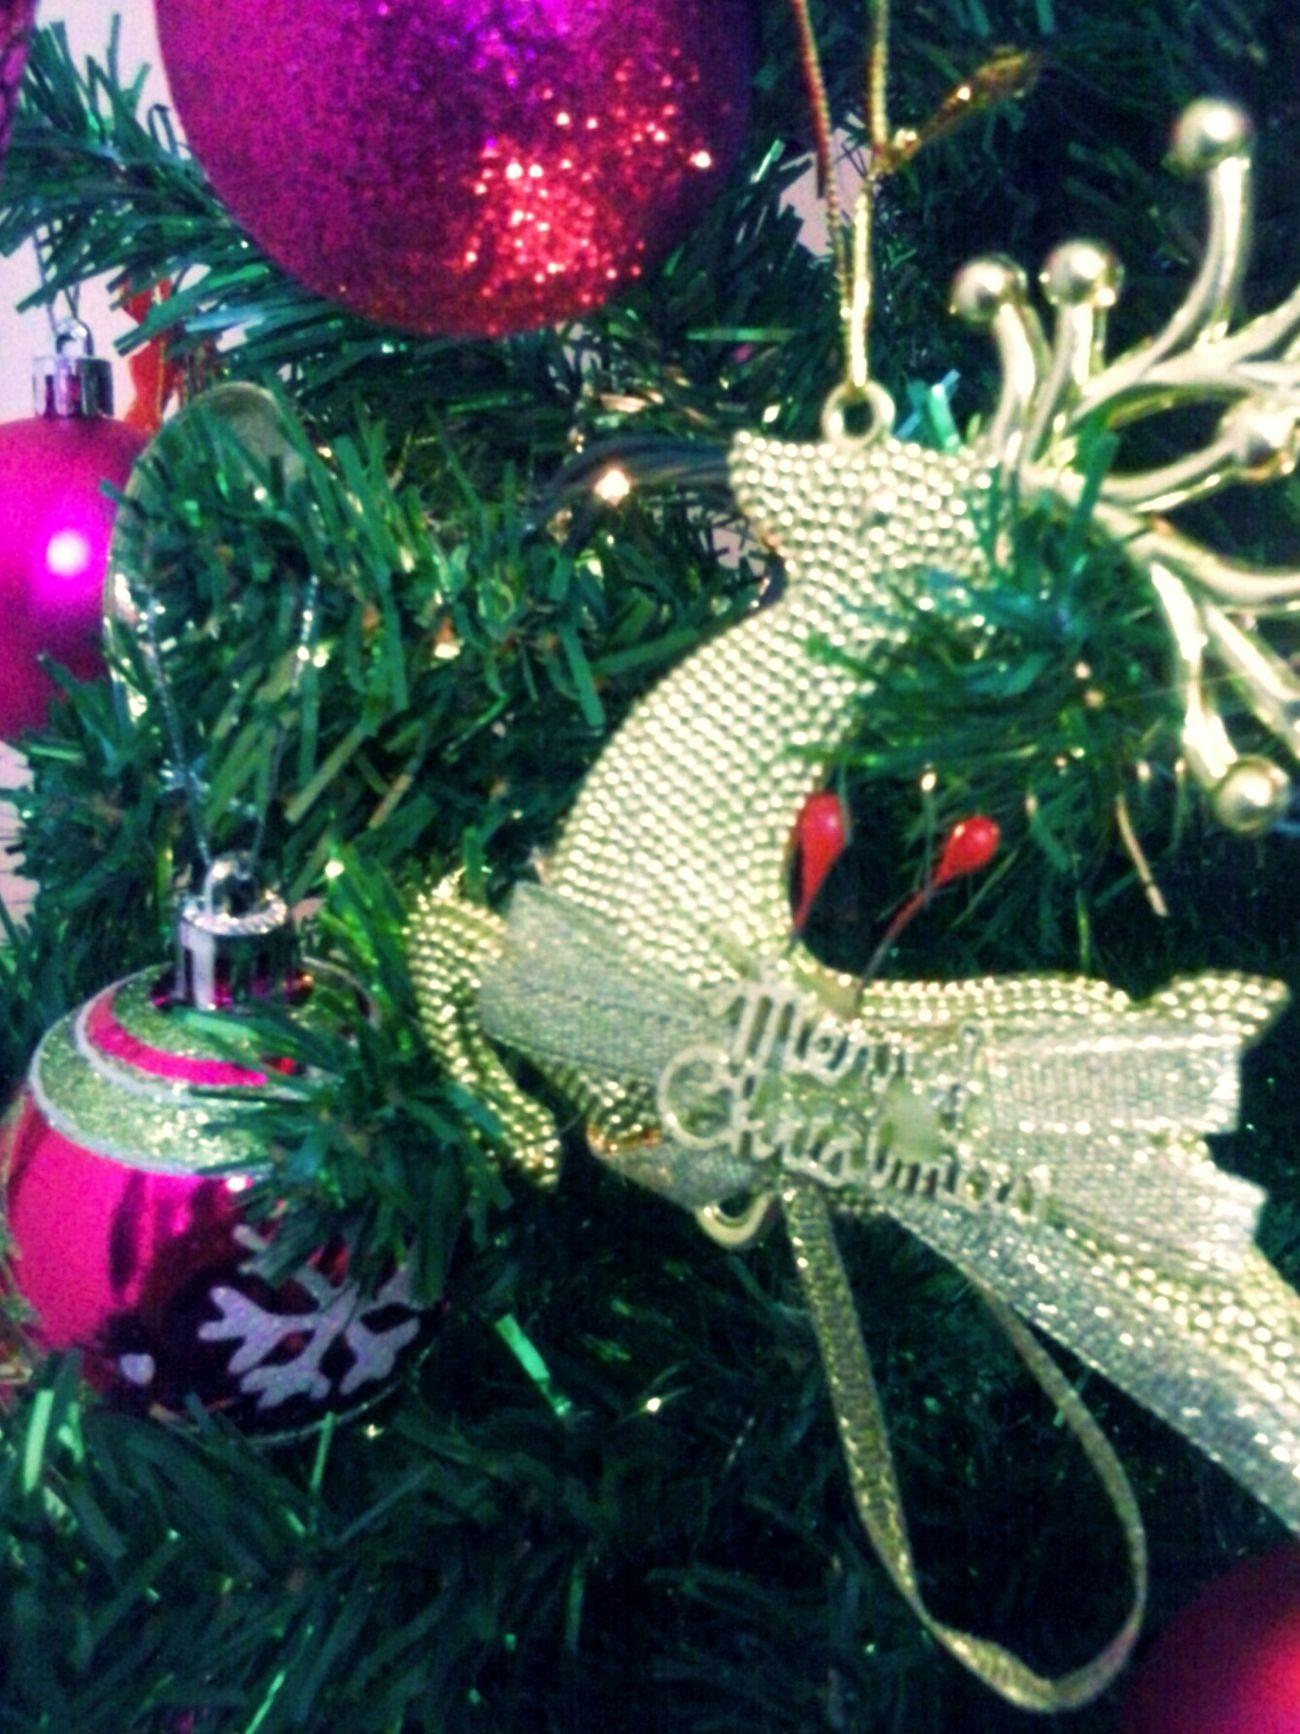 Christmas Tree Pontodevista Olhardebolso